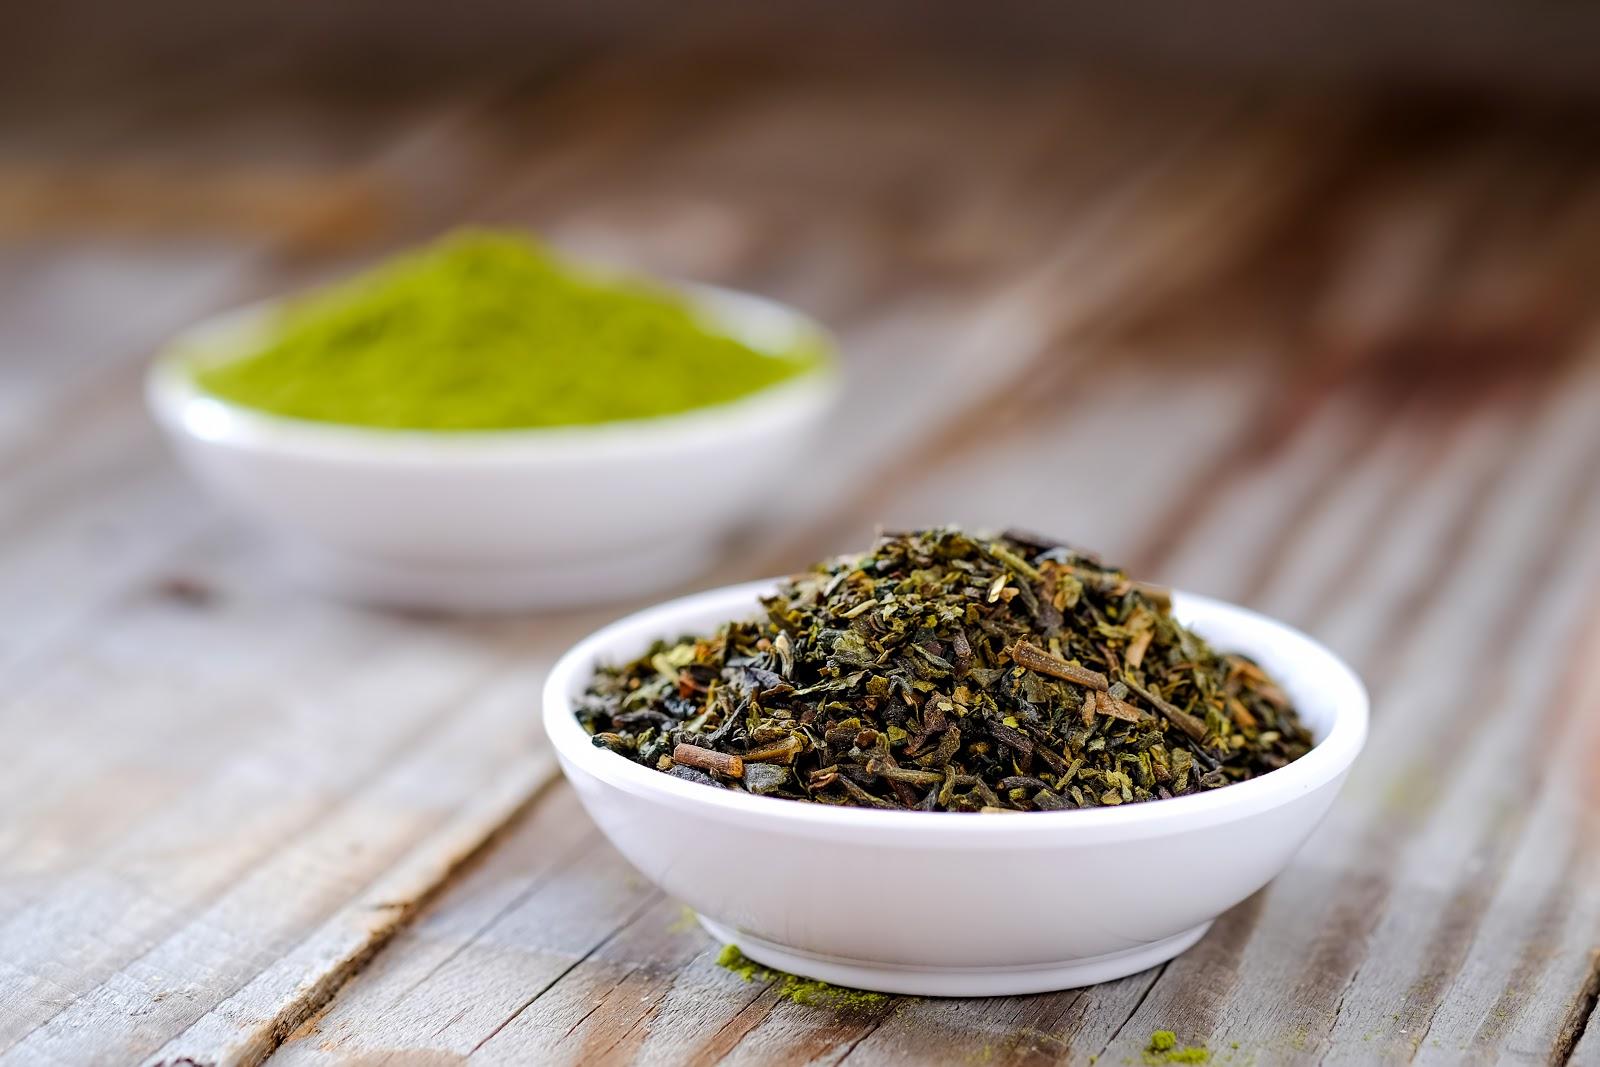 gunpowder green tea and matcha tea